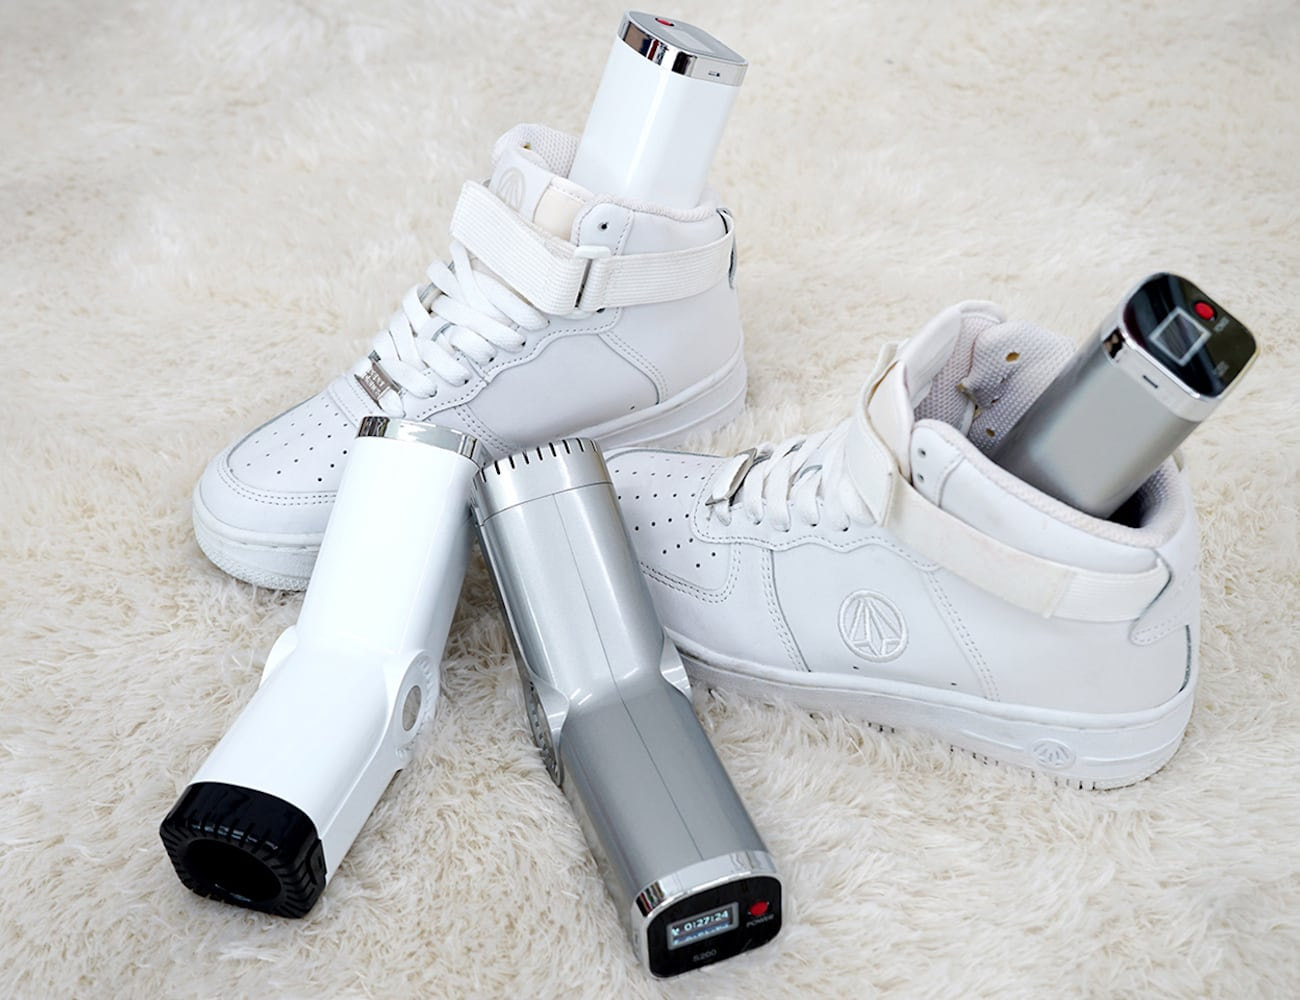 HomeCera Ceramic Shoe Dryer eliminates germs, odors, and athlete's foot